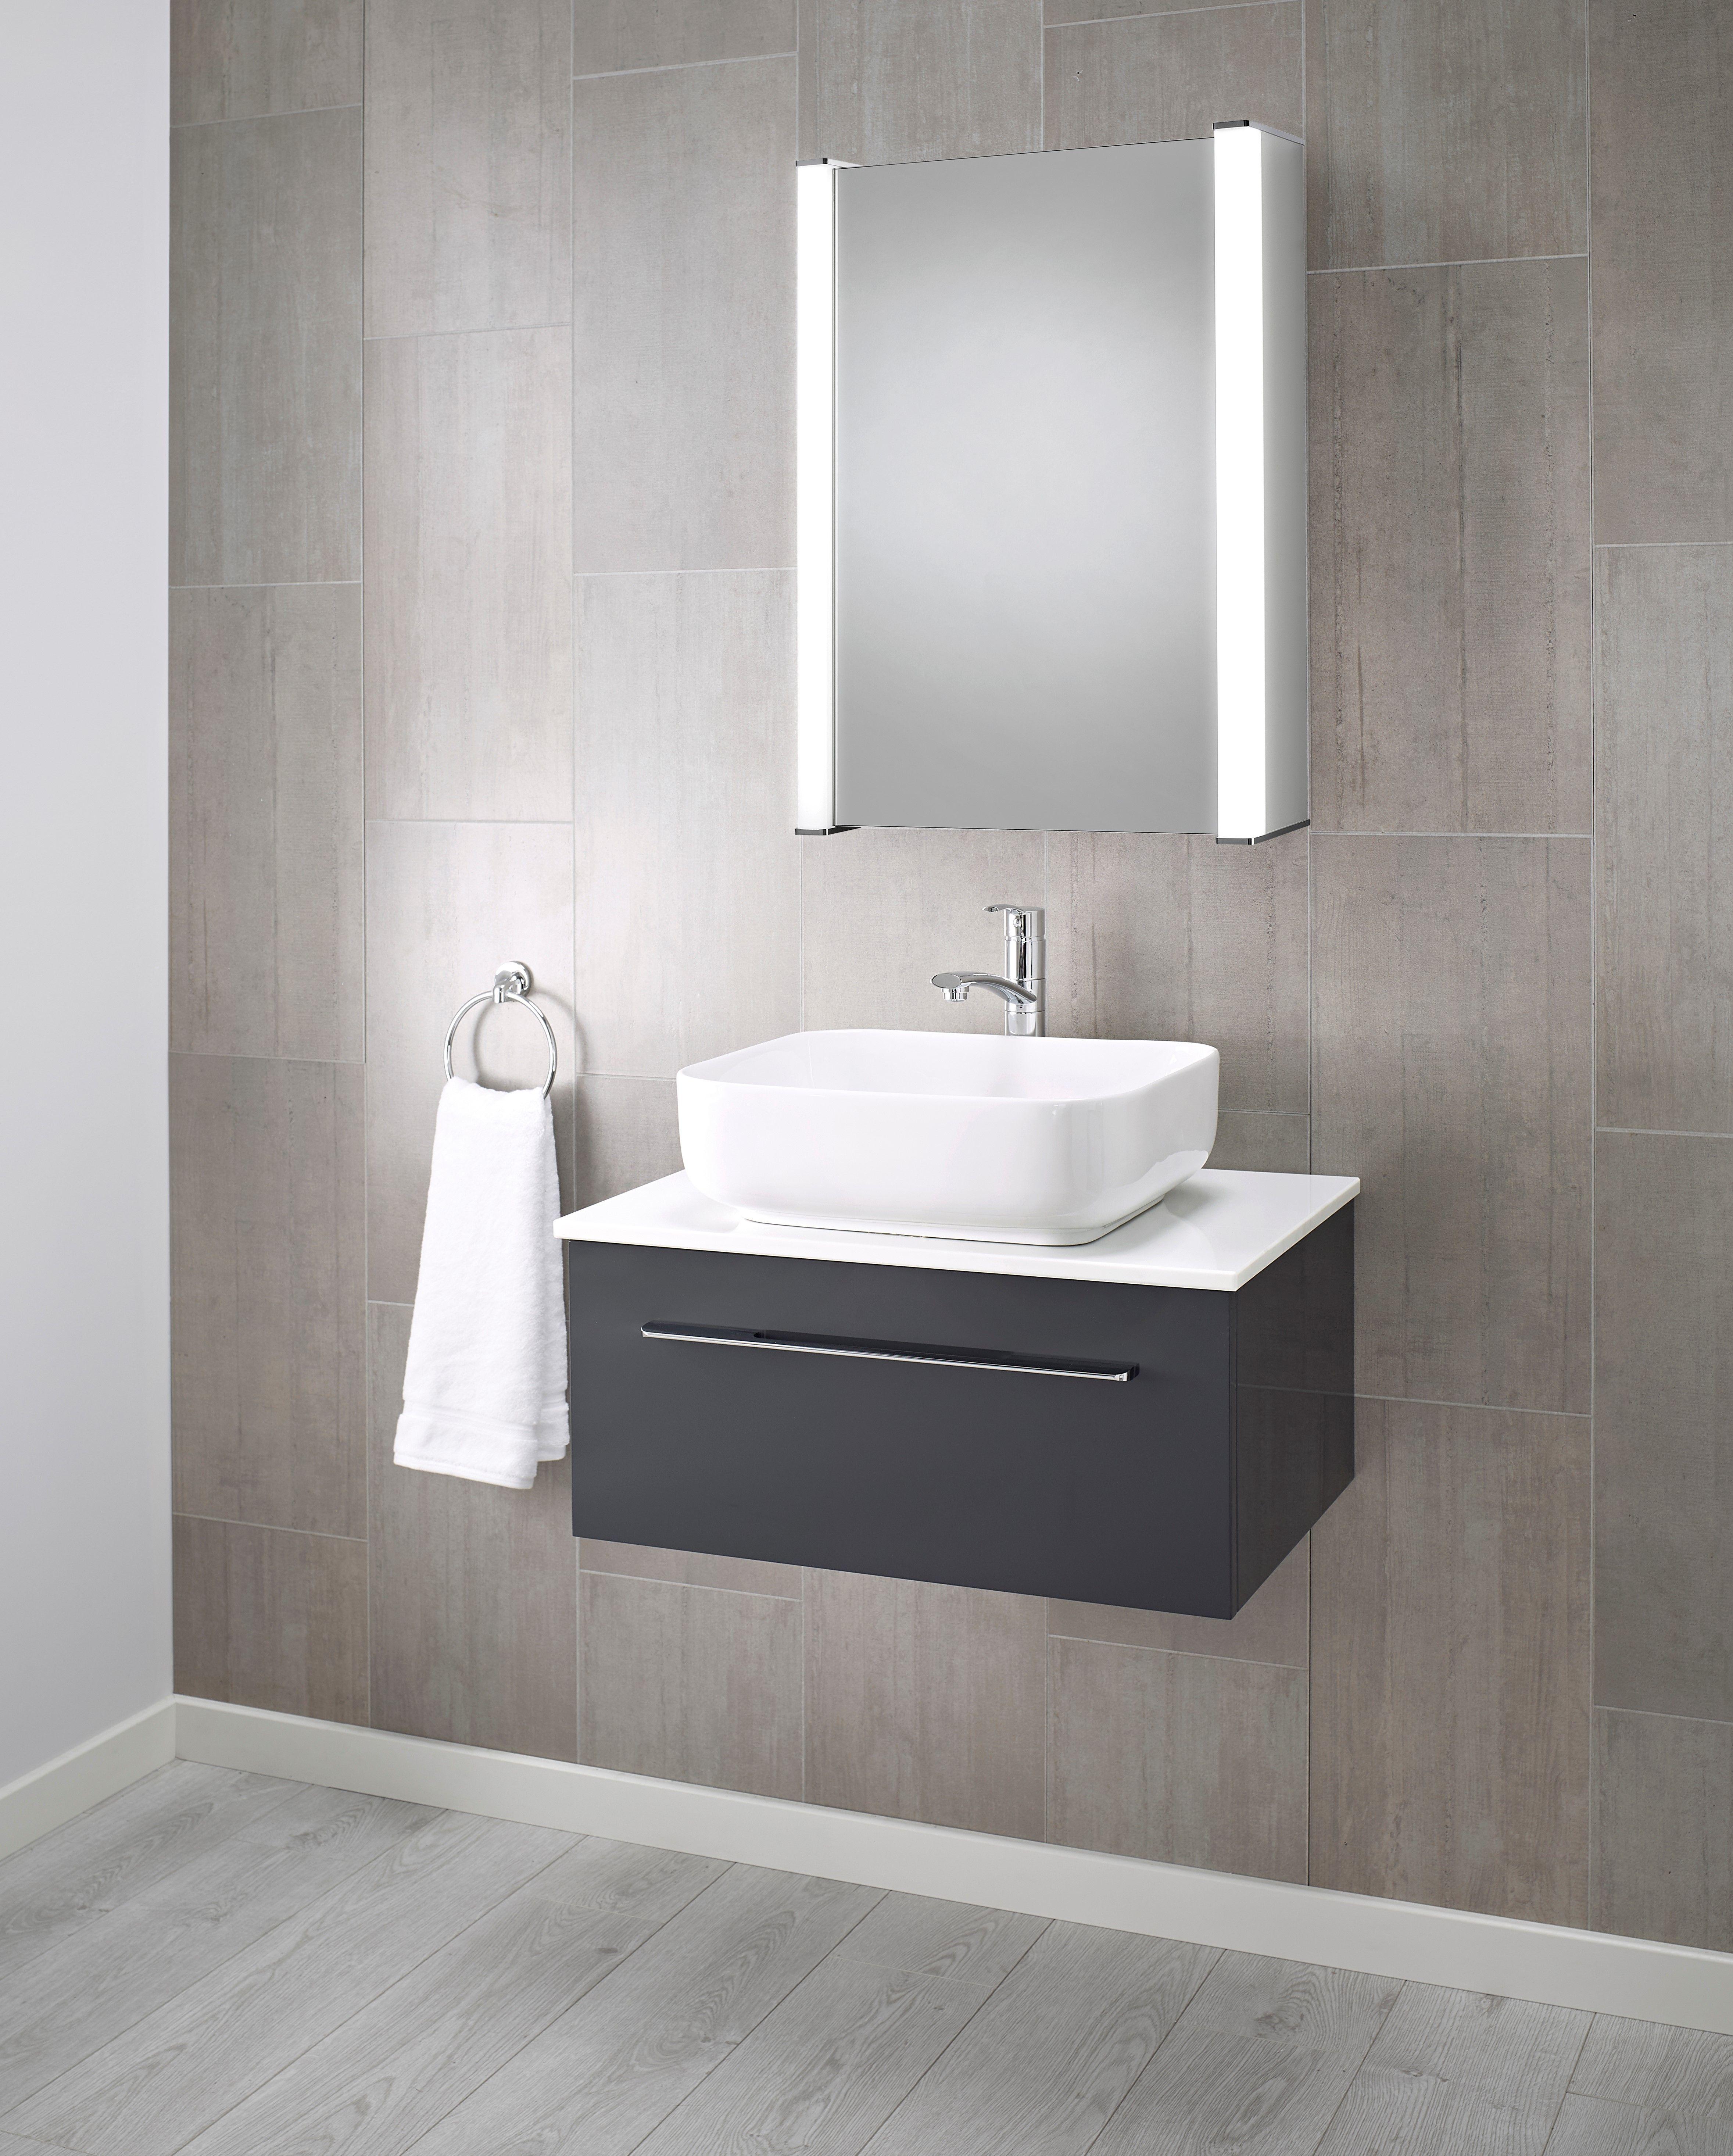 Scarlett Led Illuminated Bathroom Mirror Cabinet 500 X 700 Mm